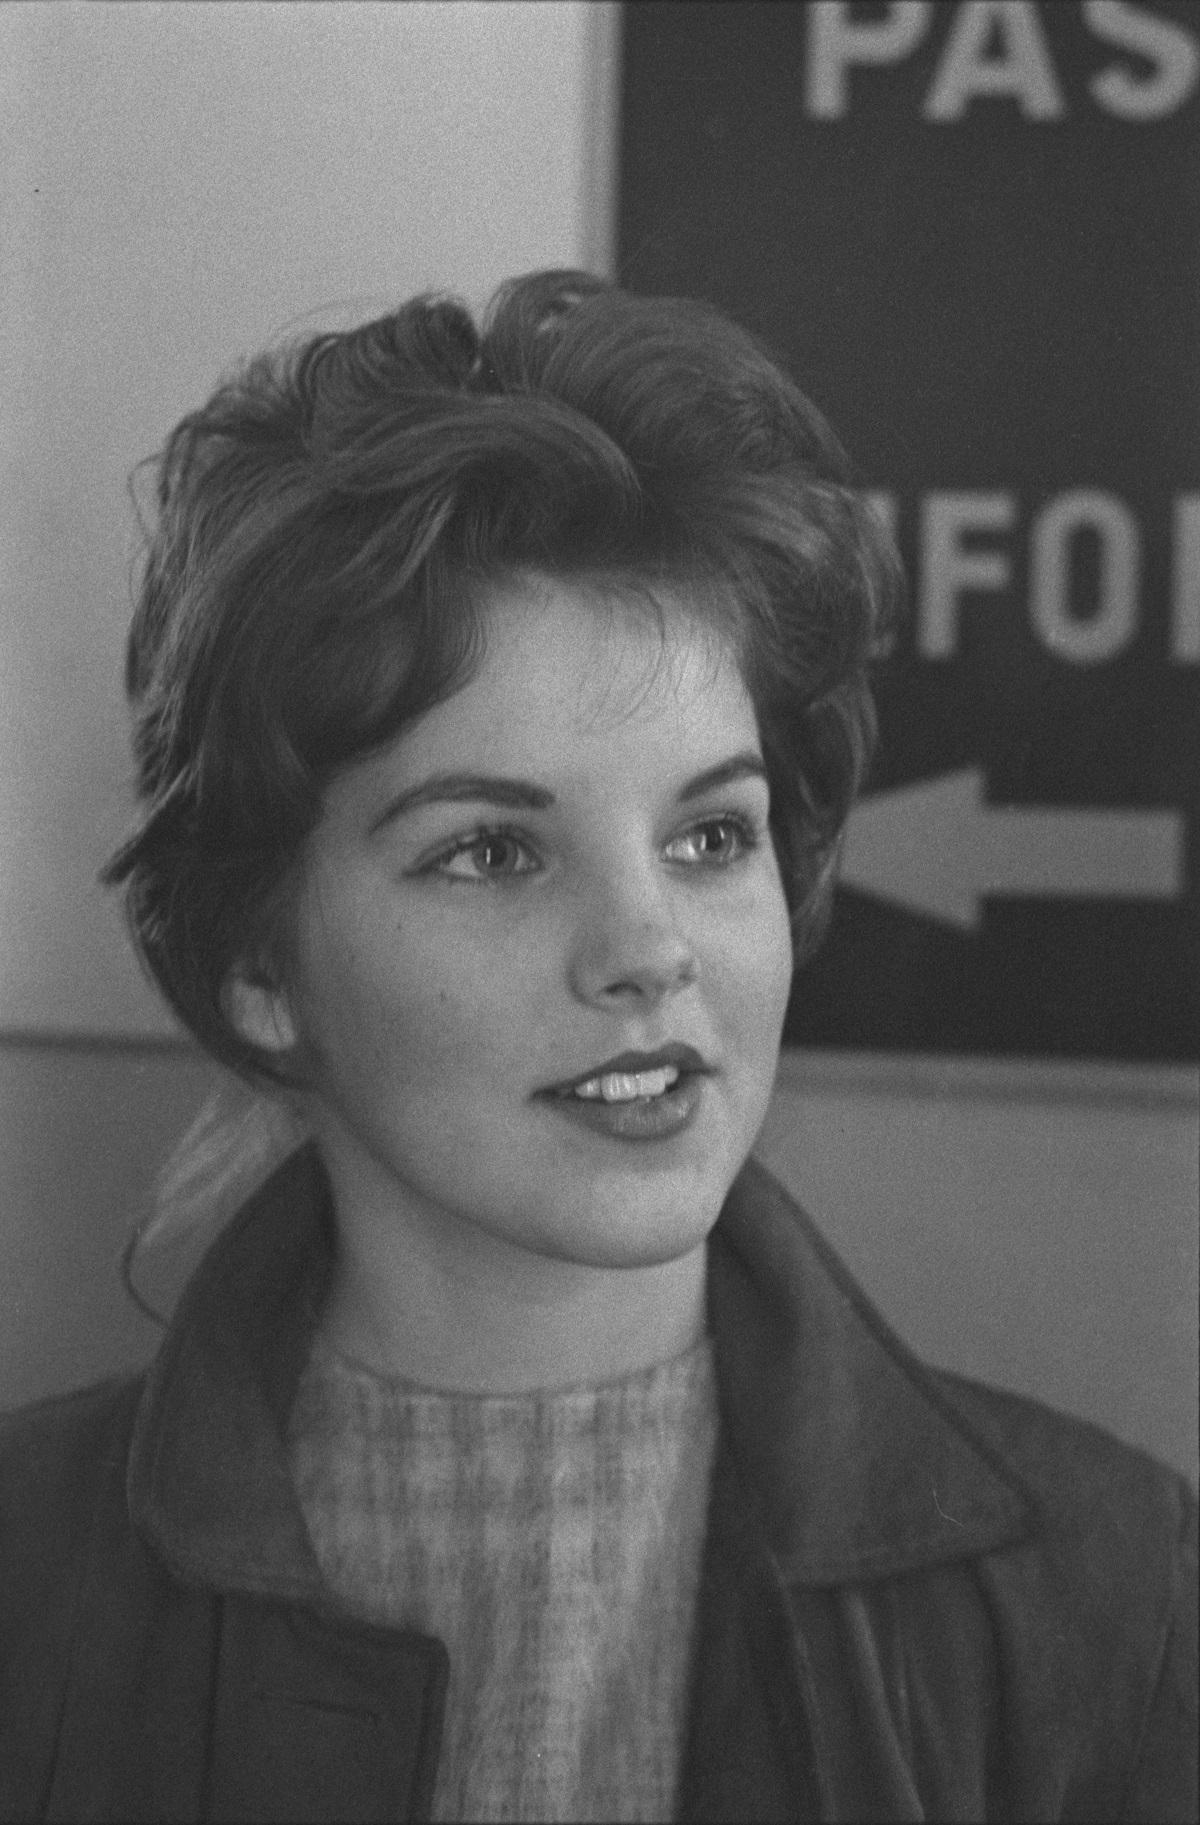 Priscilla Beaulieu Presley